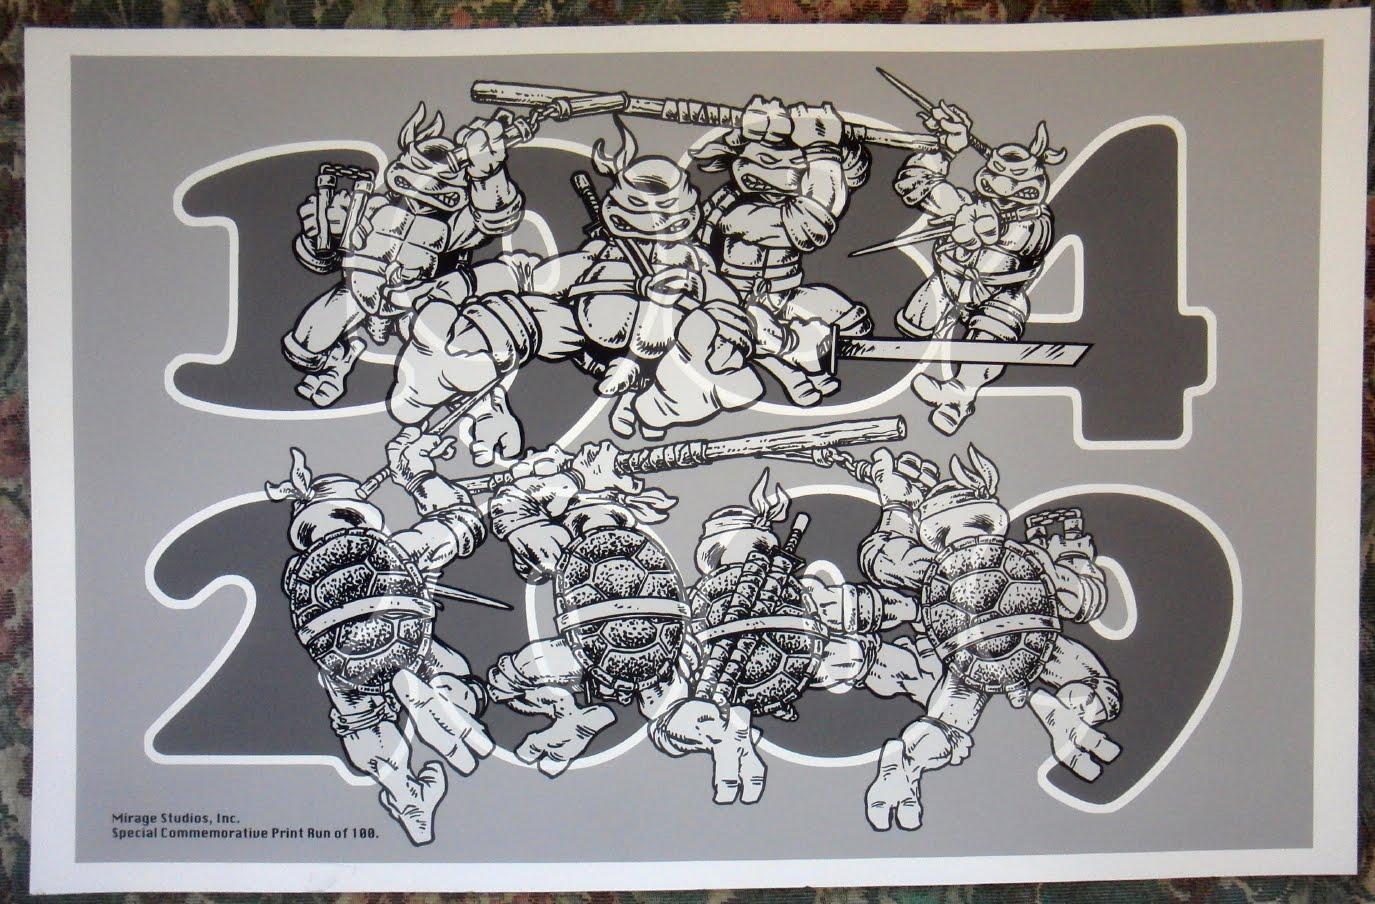 1984-2009 TMNT commemorative print sm